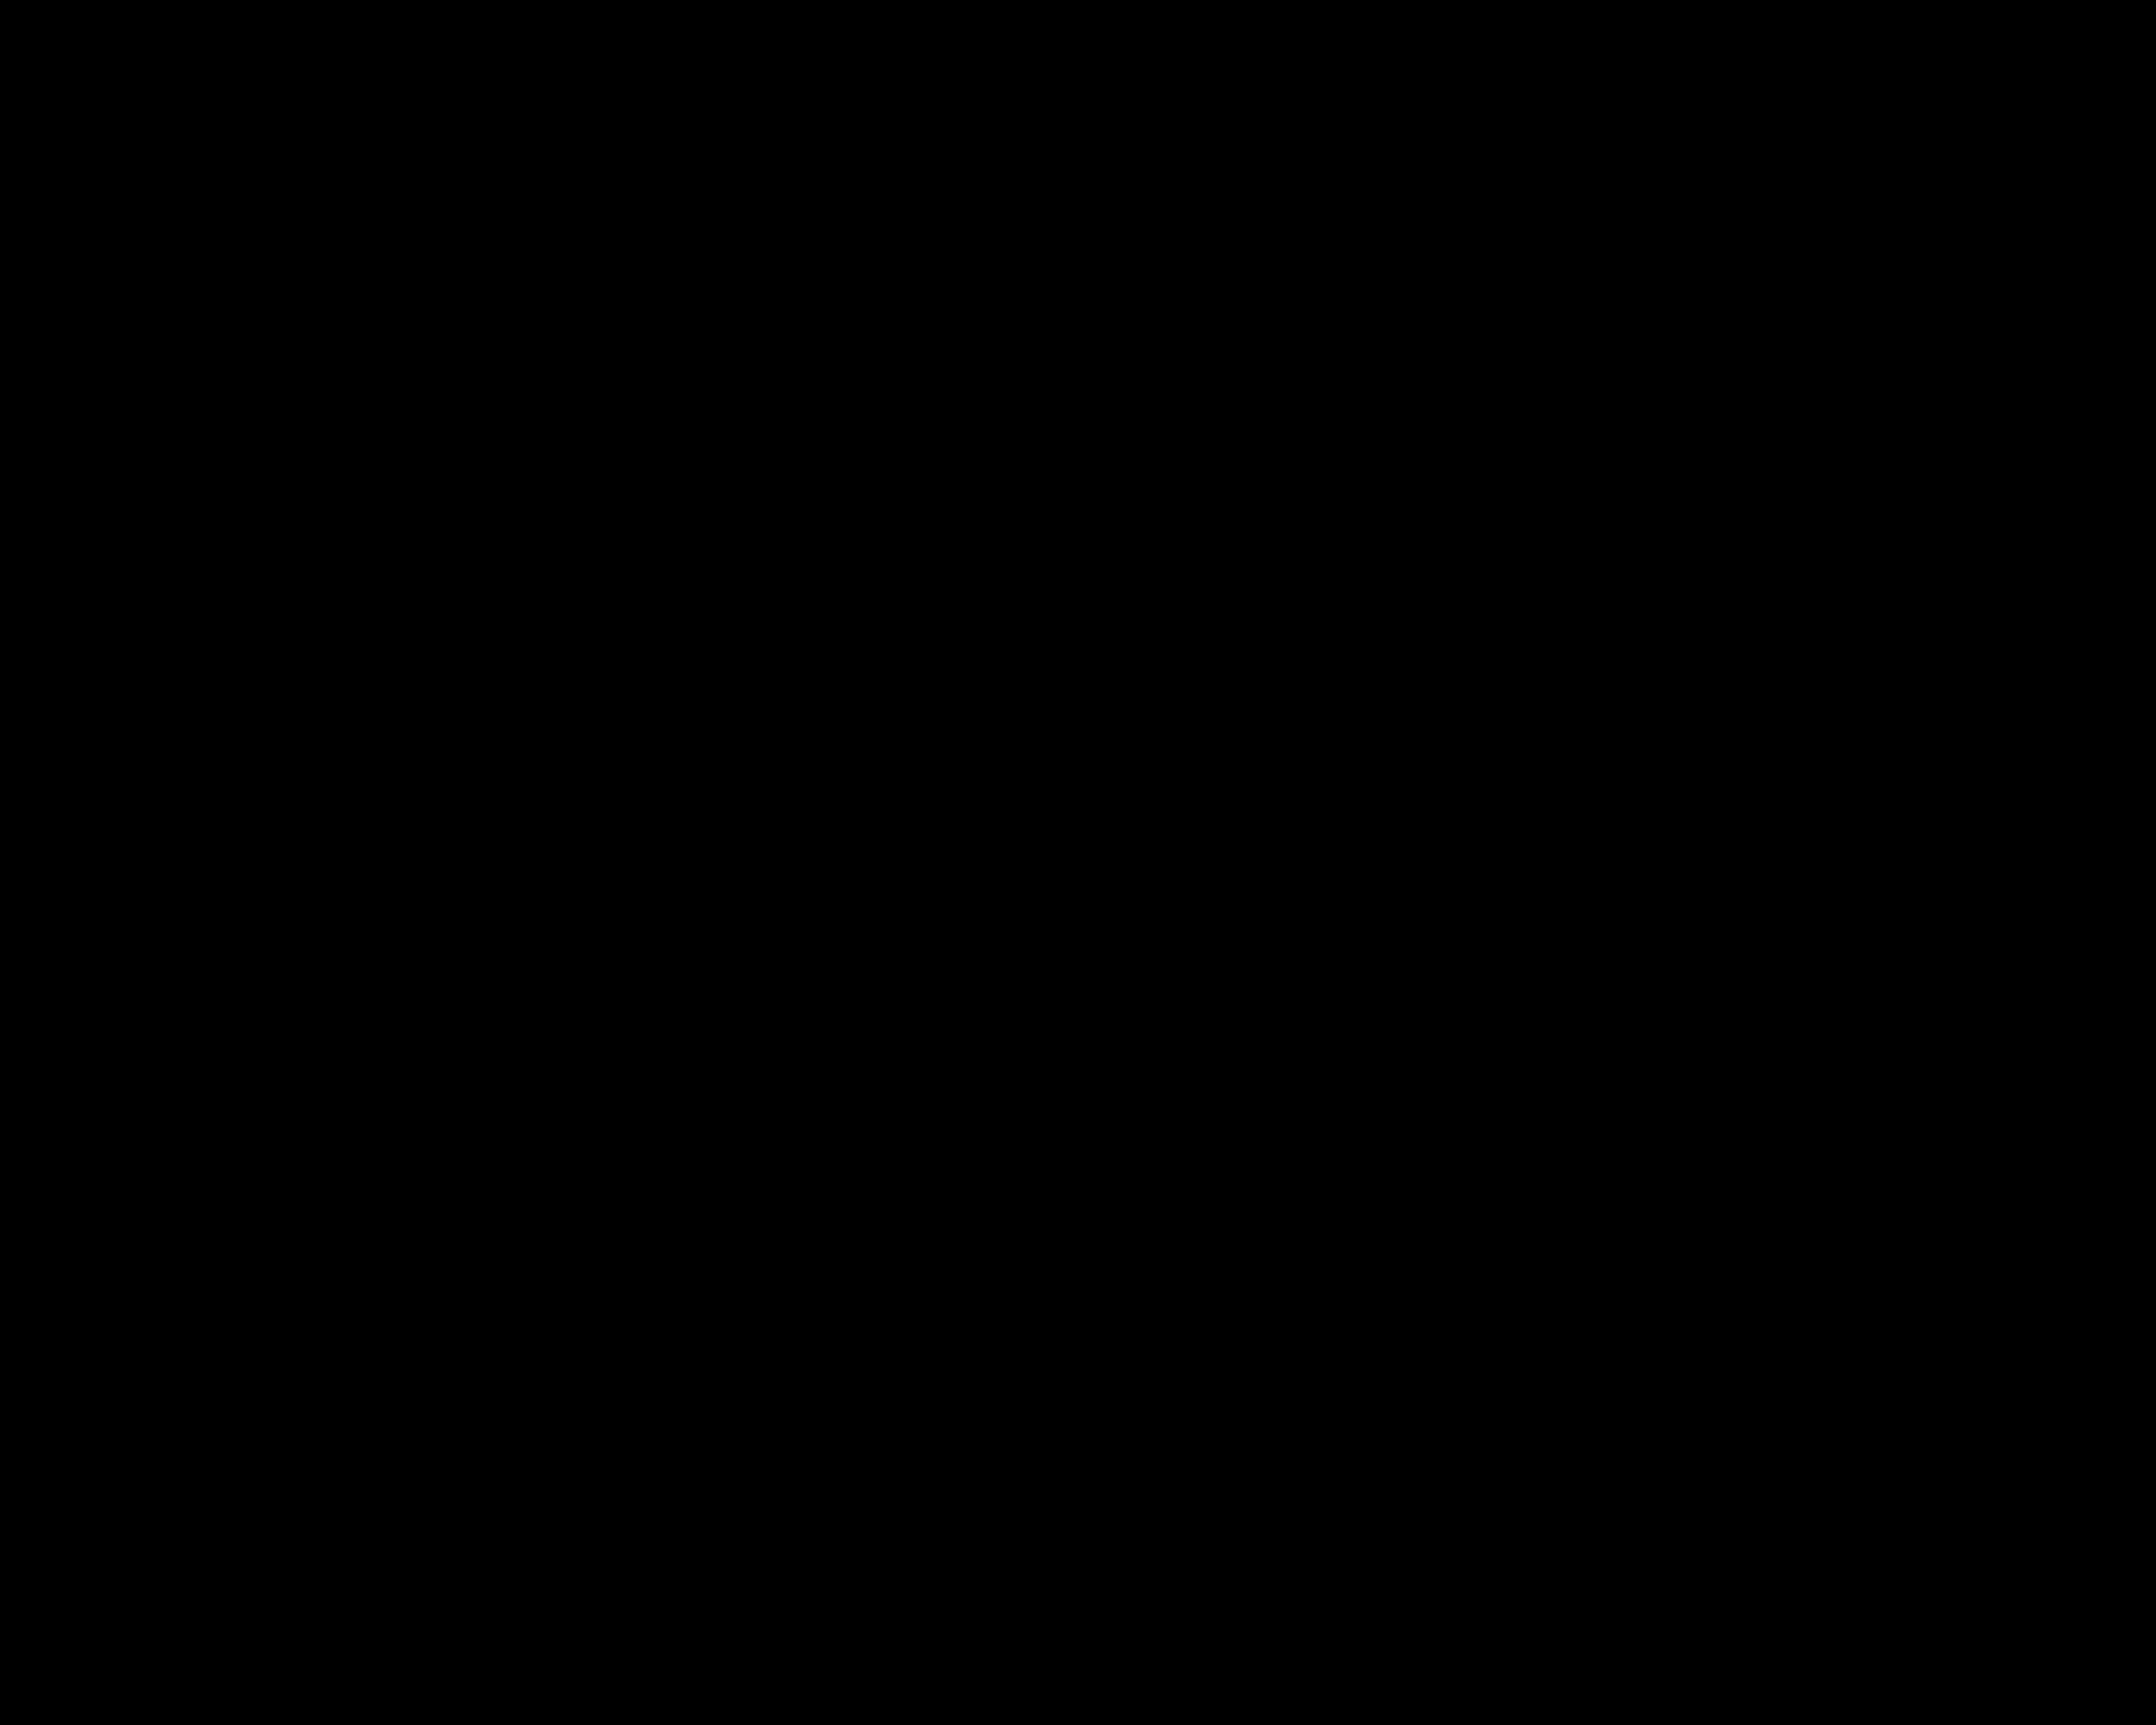 MainBannerBakeryArtboard 6-200.png